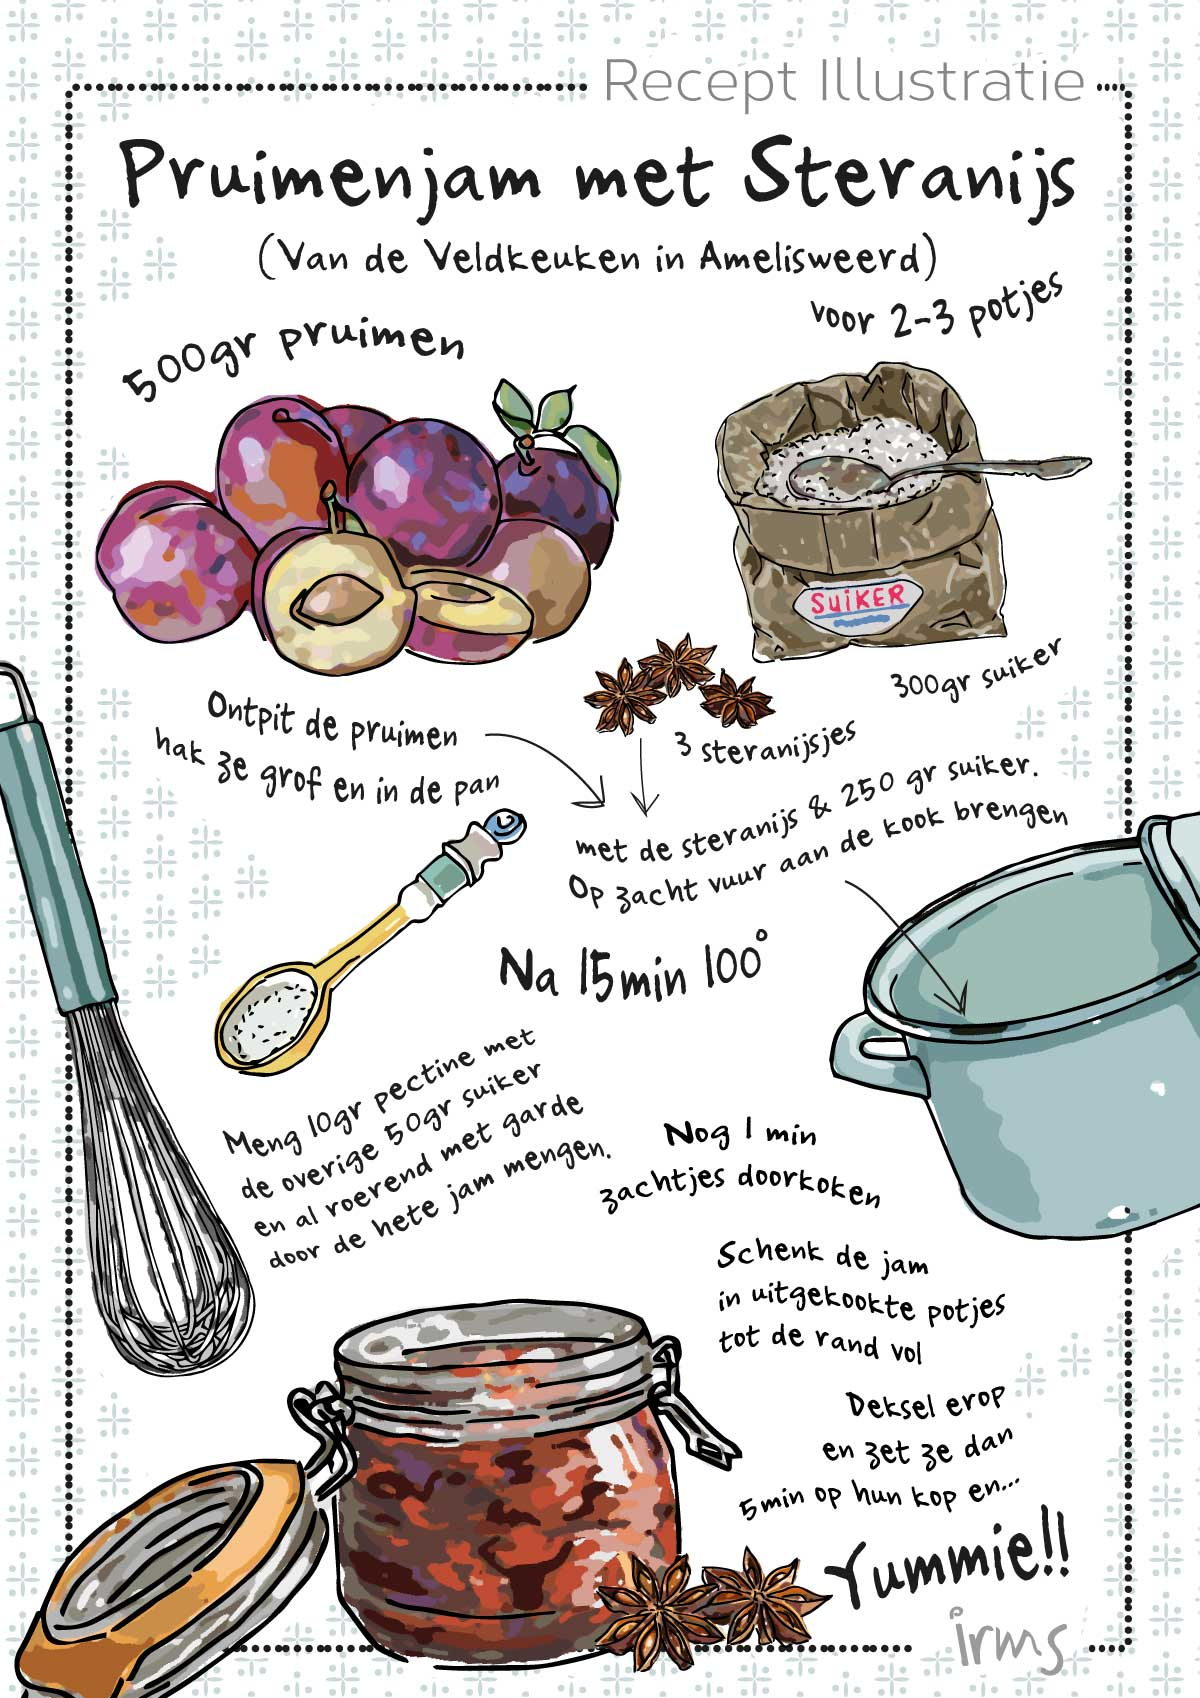 pruimenjam-recept-illustratie